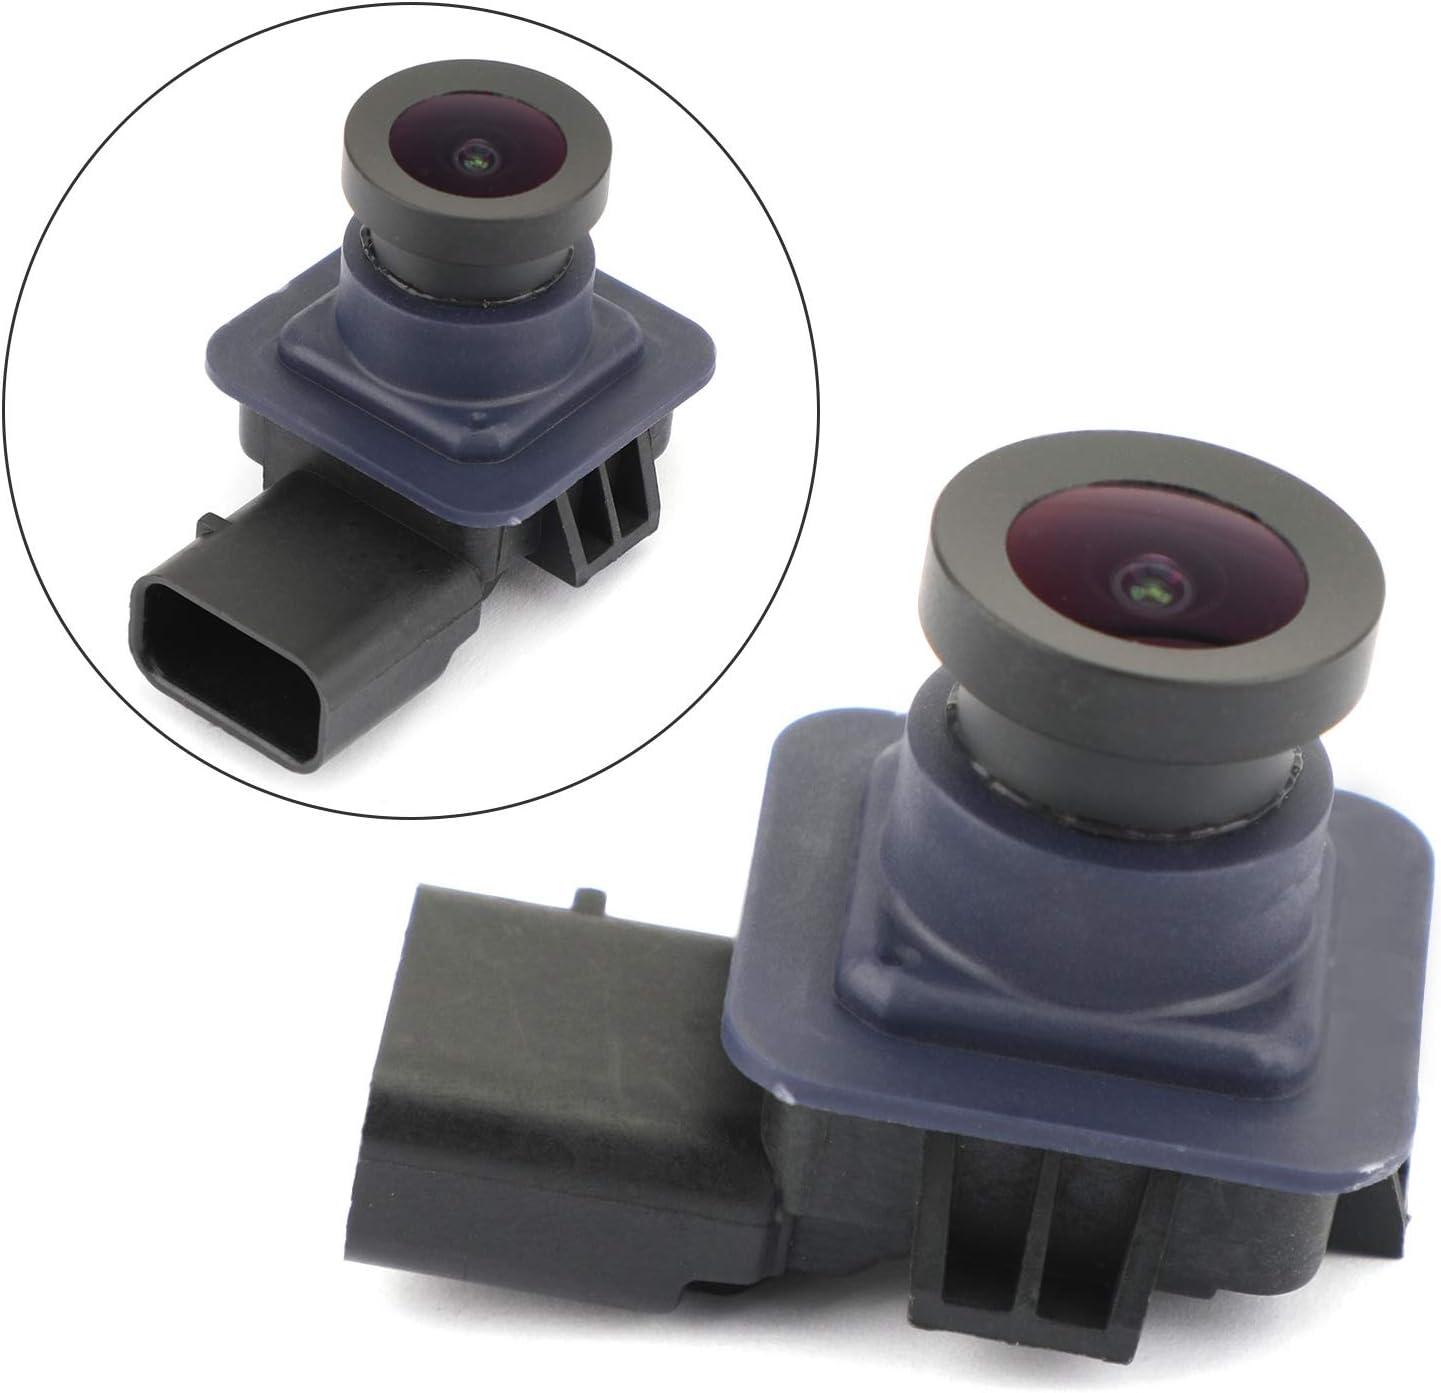 Ford Explorer Police Model 2013-2015 Topteng Car Rear View Backup Camera Parking Camera fits for Ford Explorer 2011-2015